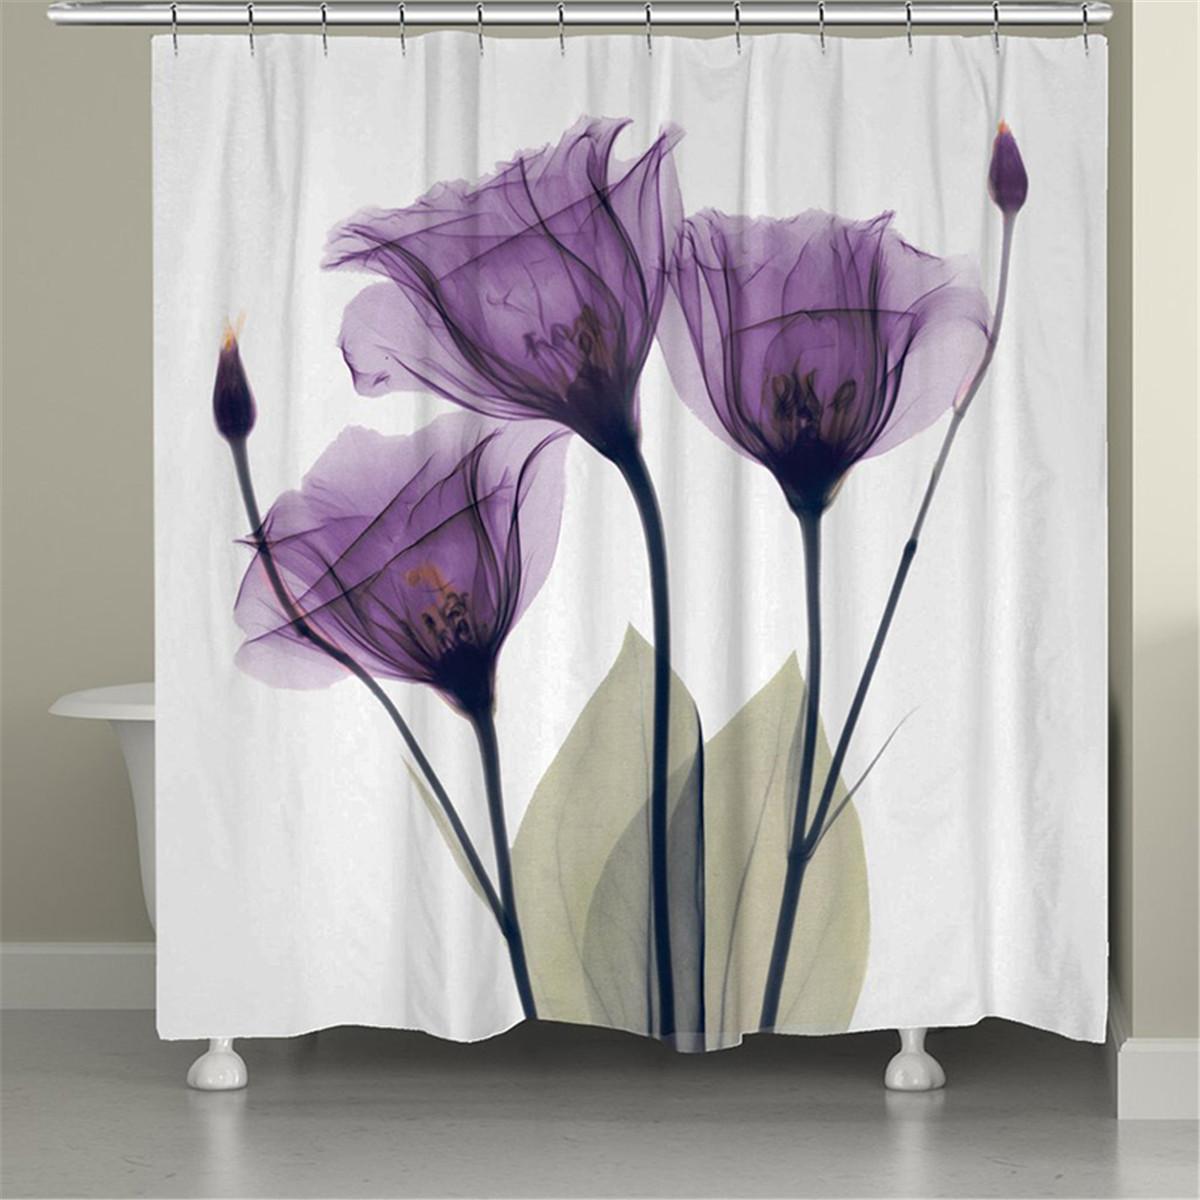 tulip shower curtain set with12 hooks shower curtains for bathroom fabric farmhouse shower curtain waterproof flower bathroom decor polyester bath